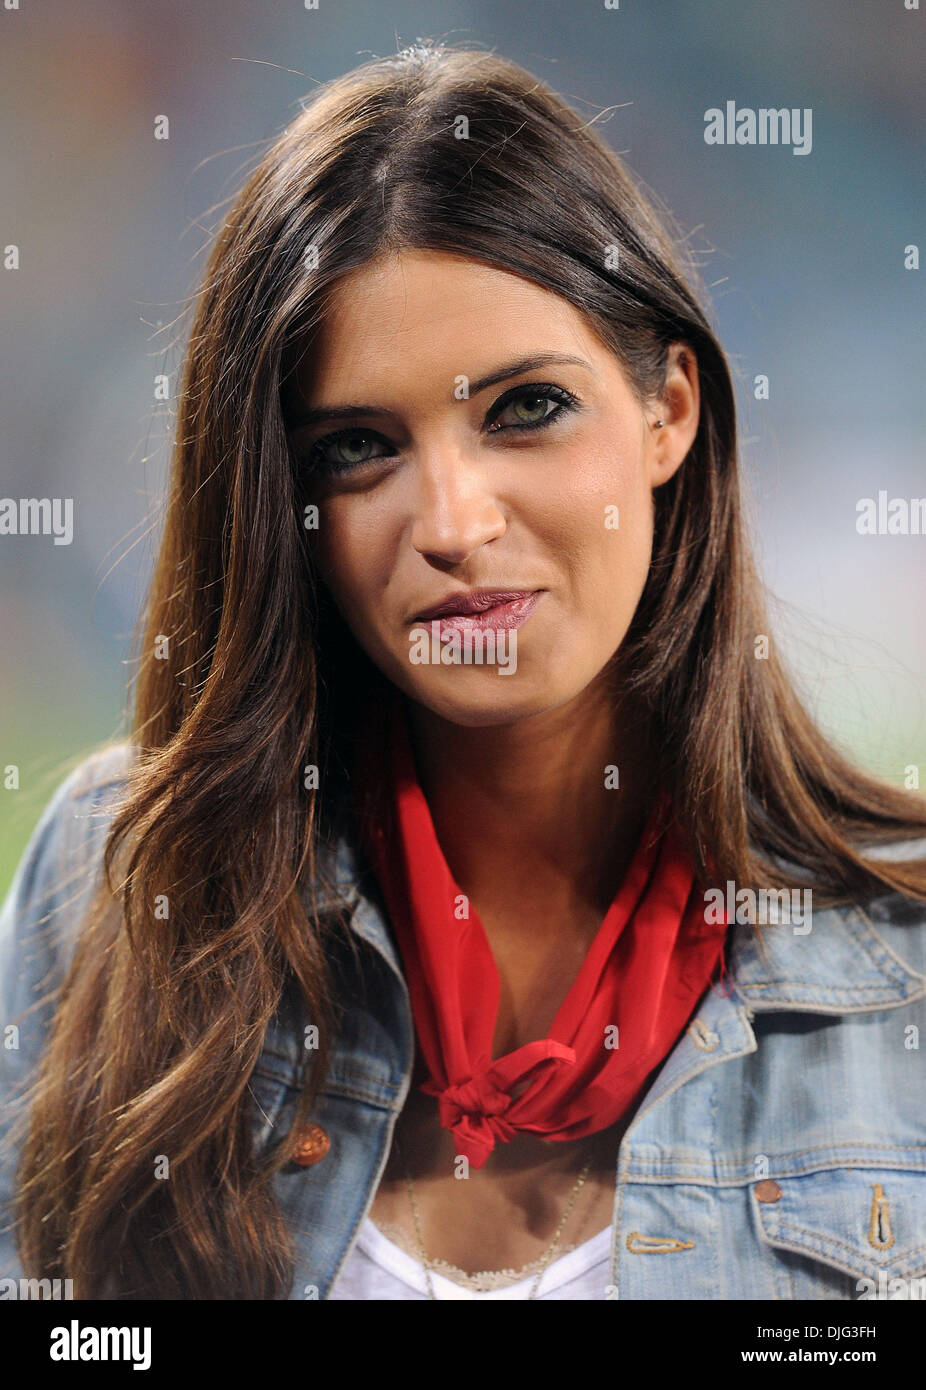 Iker Casillas Girlfriend Sara Carbonero Stock Photos ...